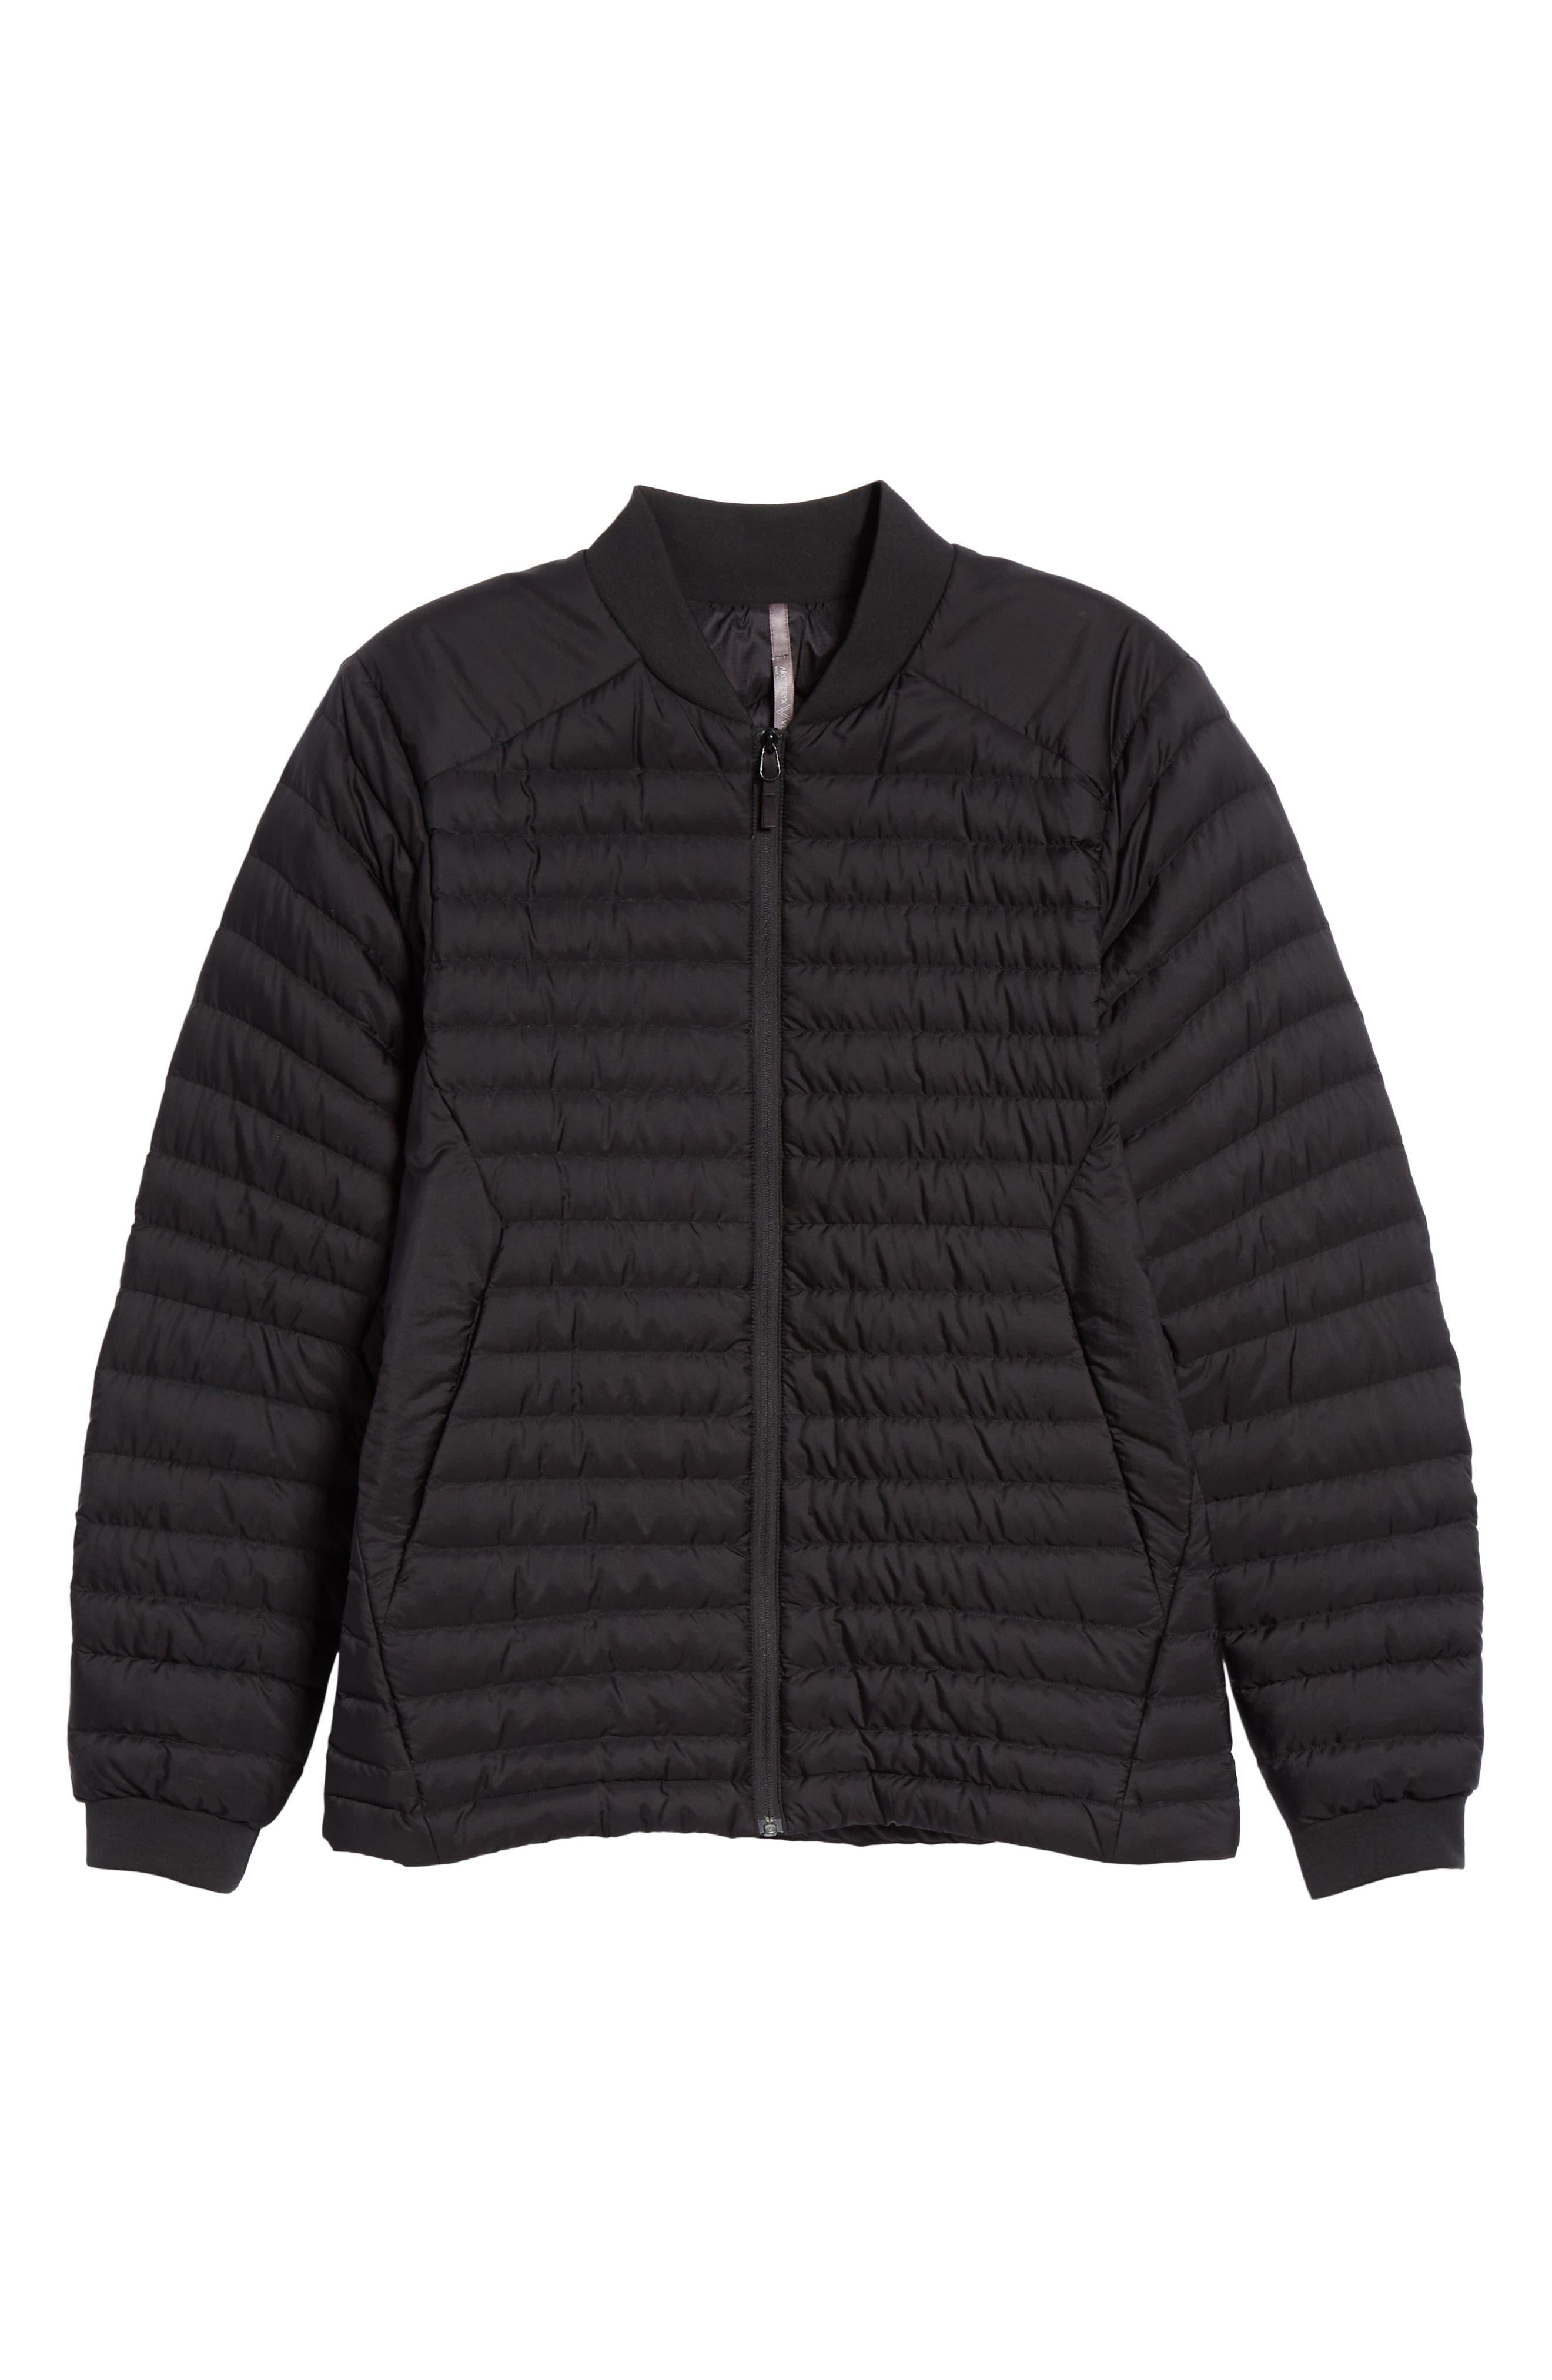 ARC'TERYX VEILANCE Conduit Lightweight Down Jacket, Main, color, 001